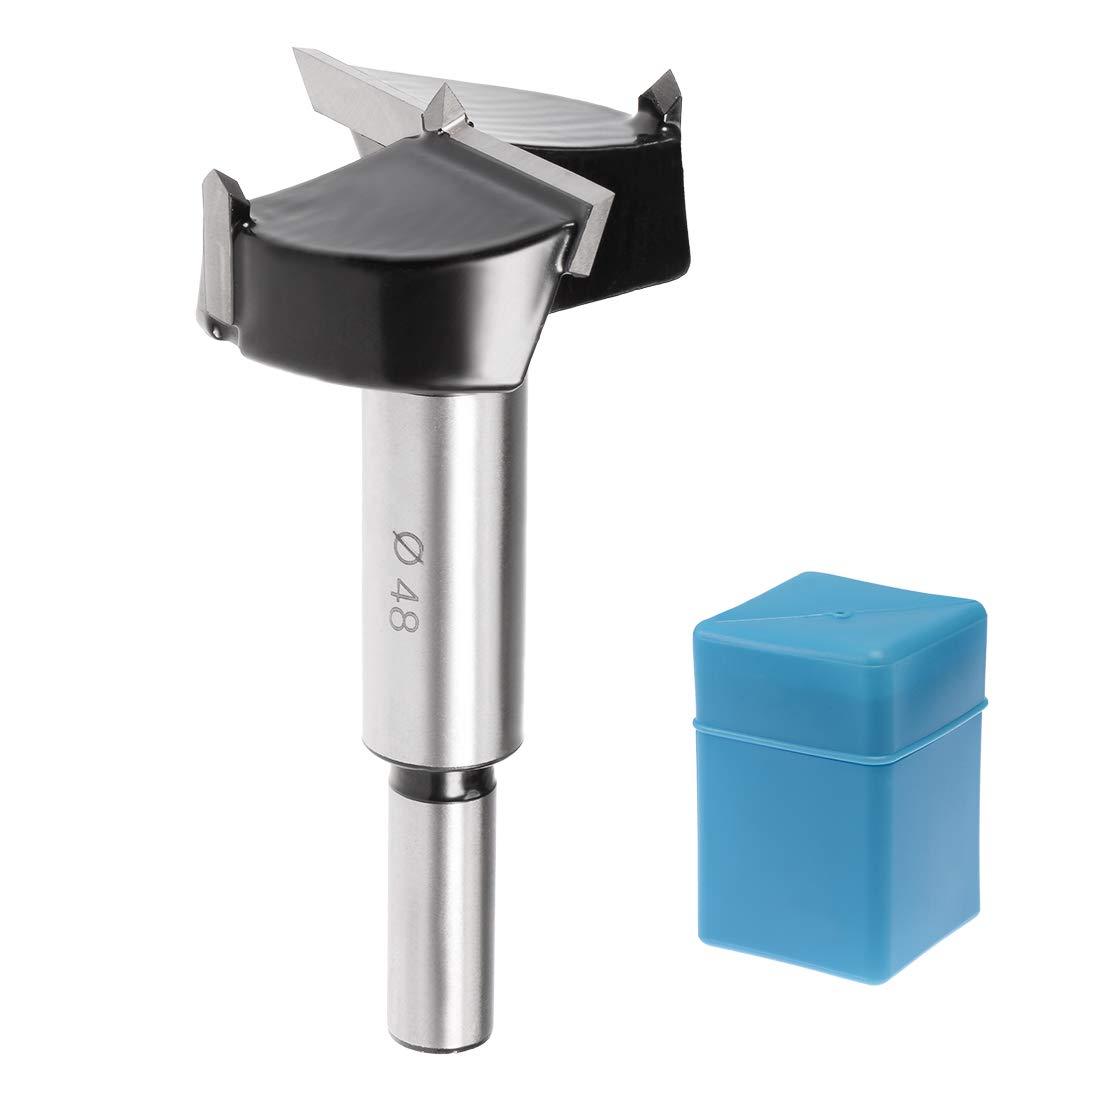 40mm Diameter uxcell Forstner Drill Bit 10mm x 30mm Shank